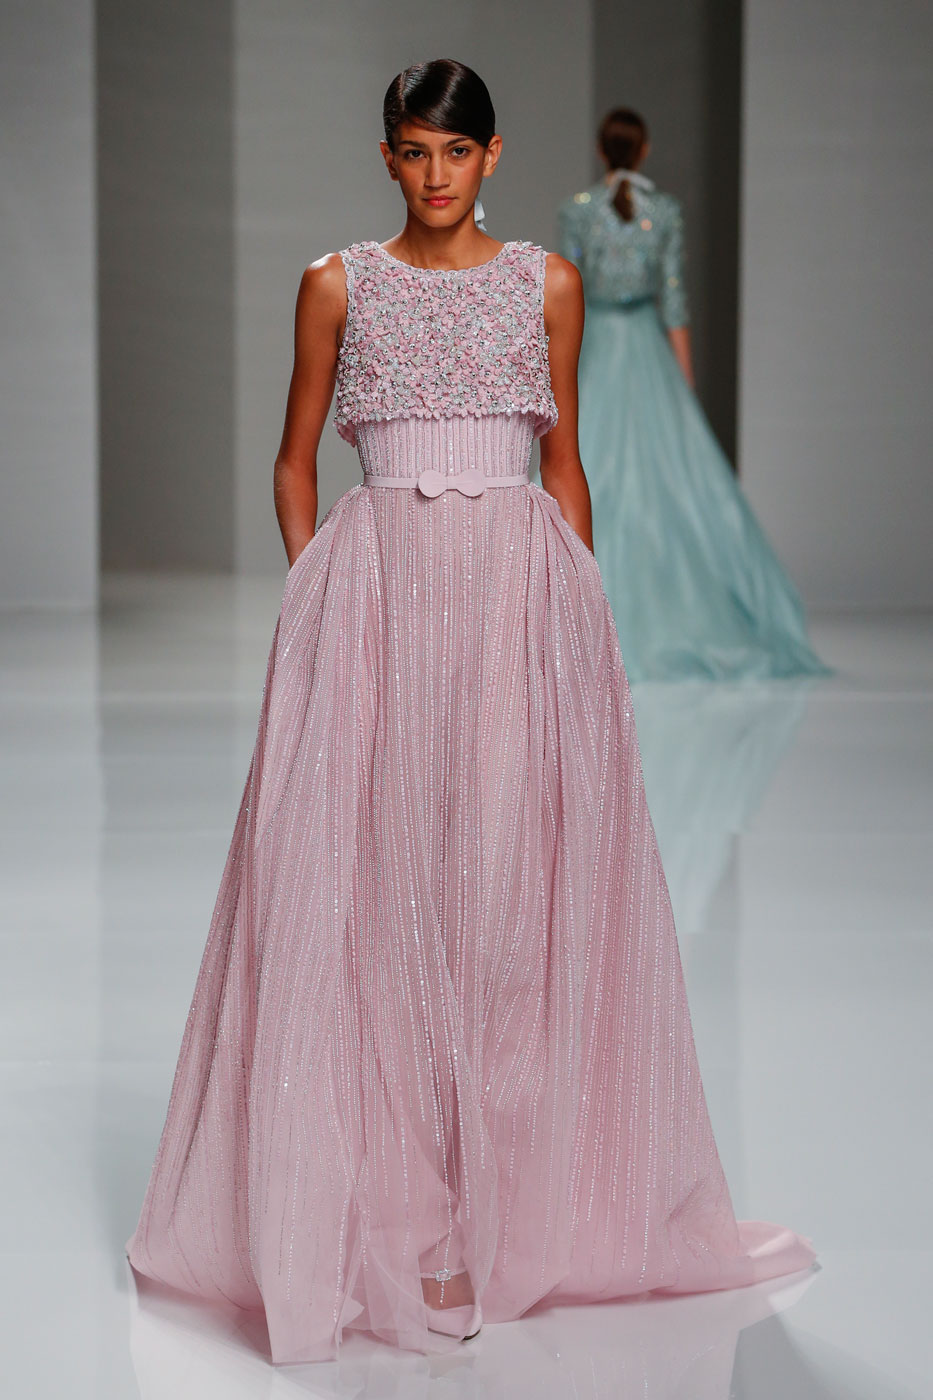 Georges-Hobeika-fashion-runway-show-haute-couture-paris-spring-2015-the-impression-21